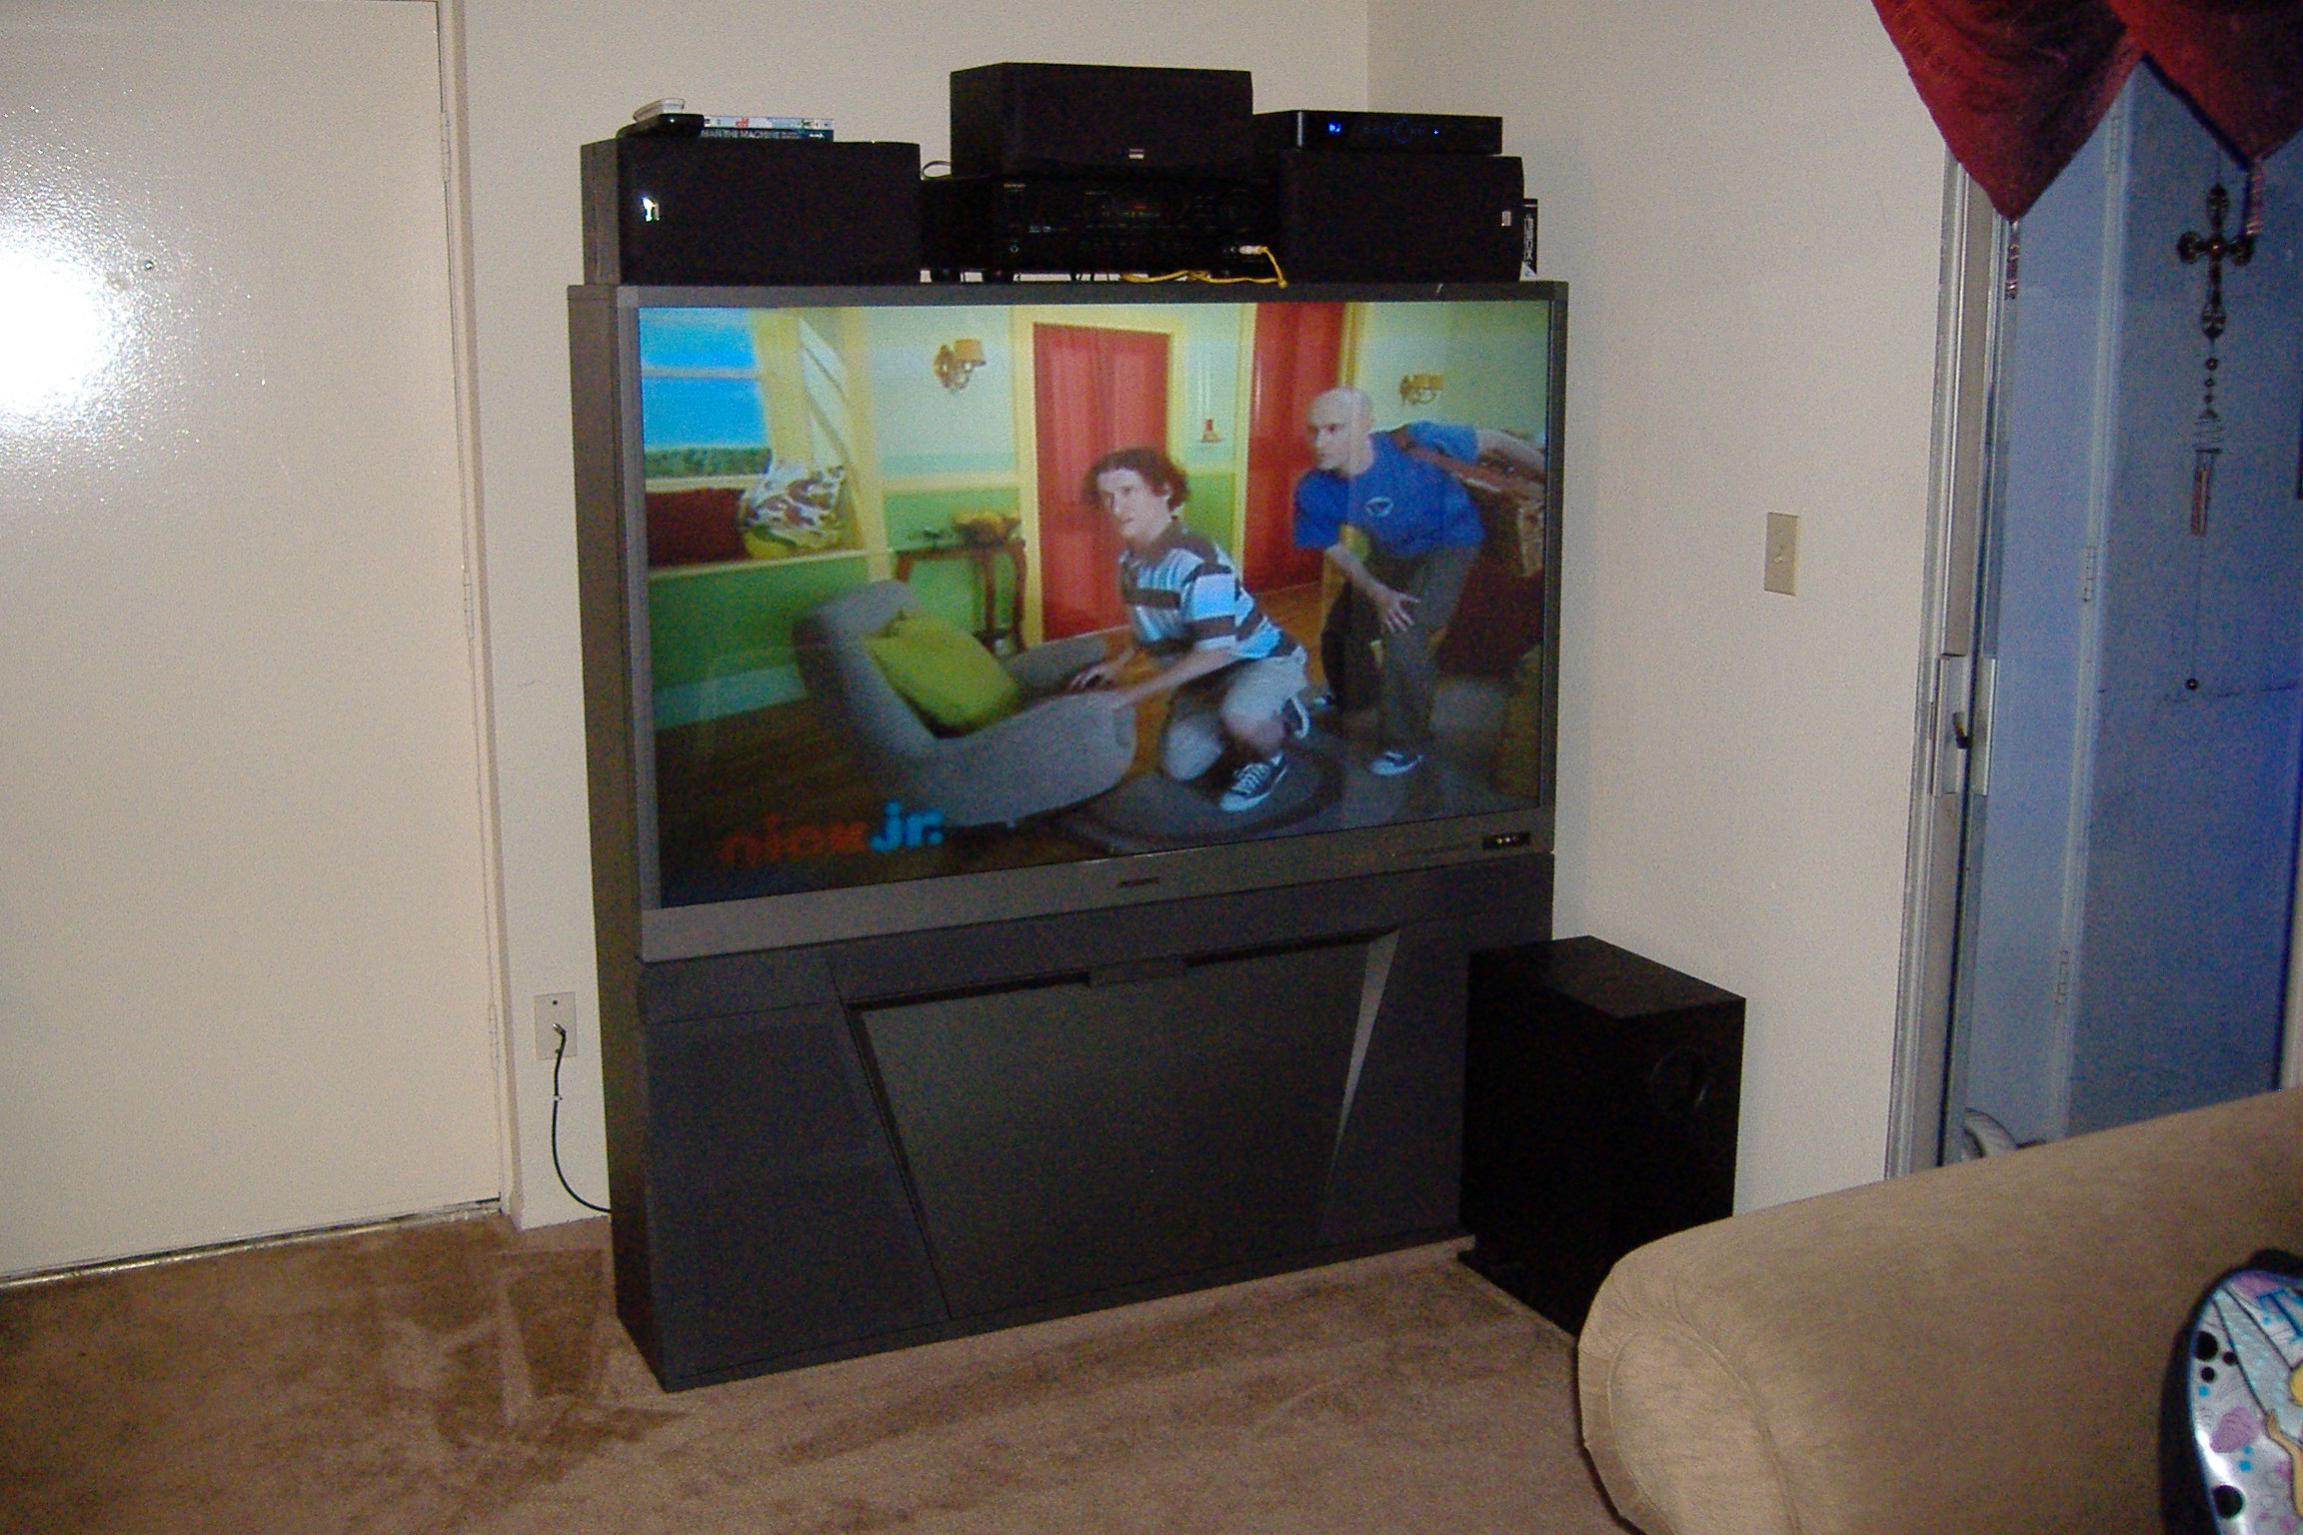 Marvelous FS: Mitsubishi 65 Inch TV My Tv